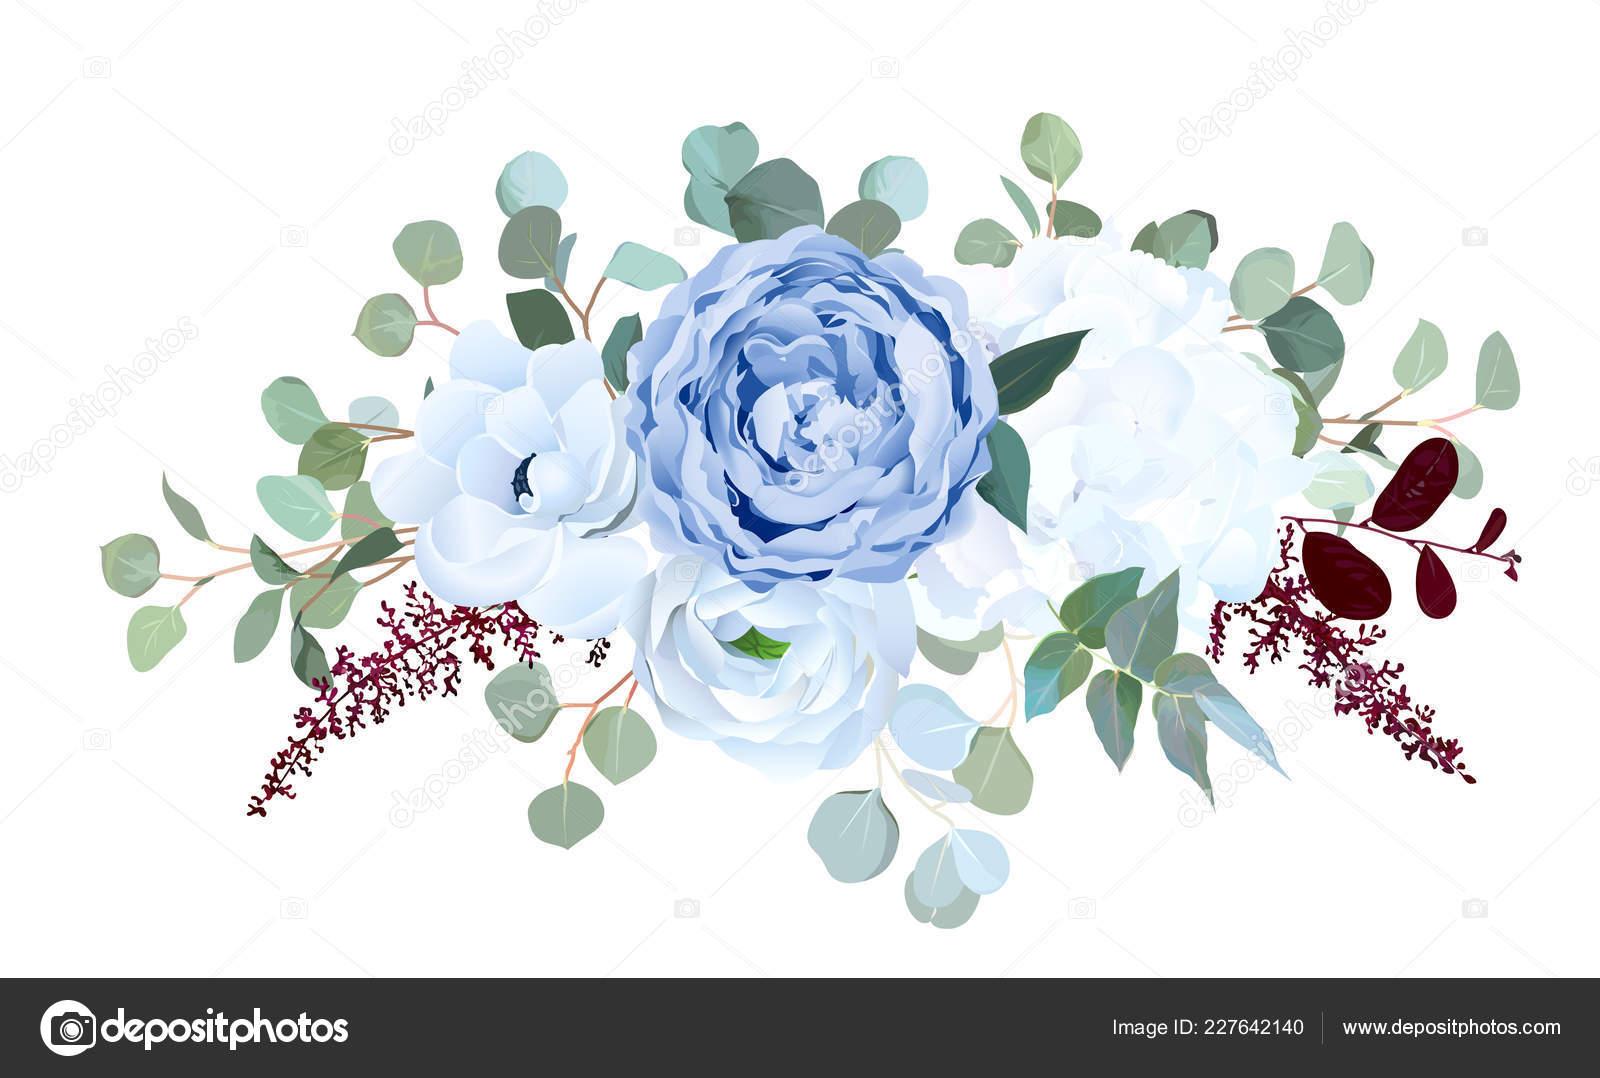 Dusty Blue Rose White Hydrangea Ranunculus Anemone Eucalyptu Vector Image By C Lavendertime Vector Stock 227642140